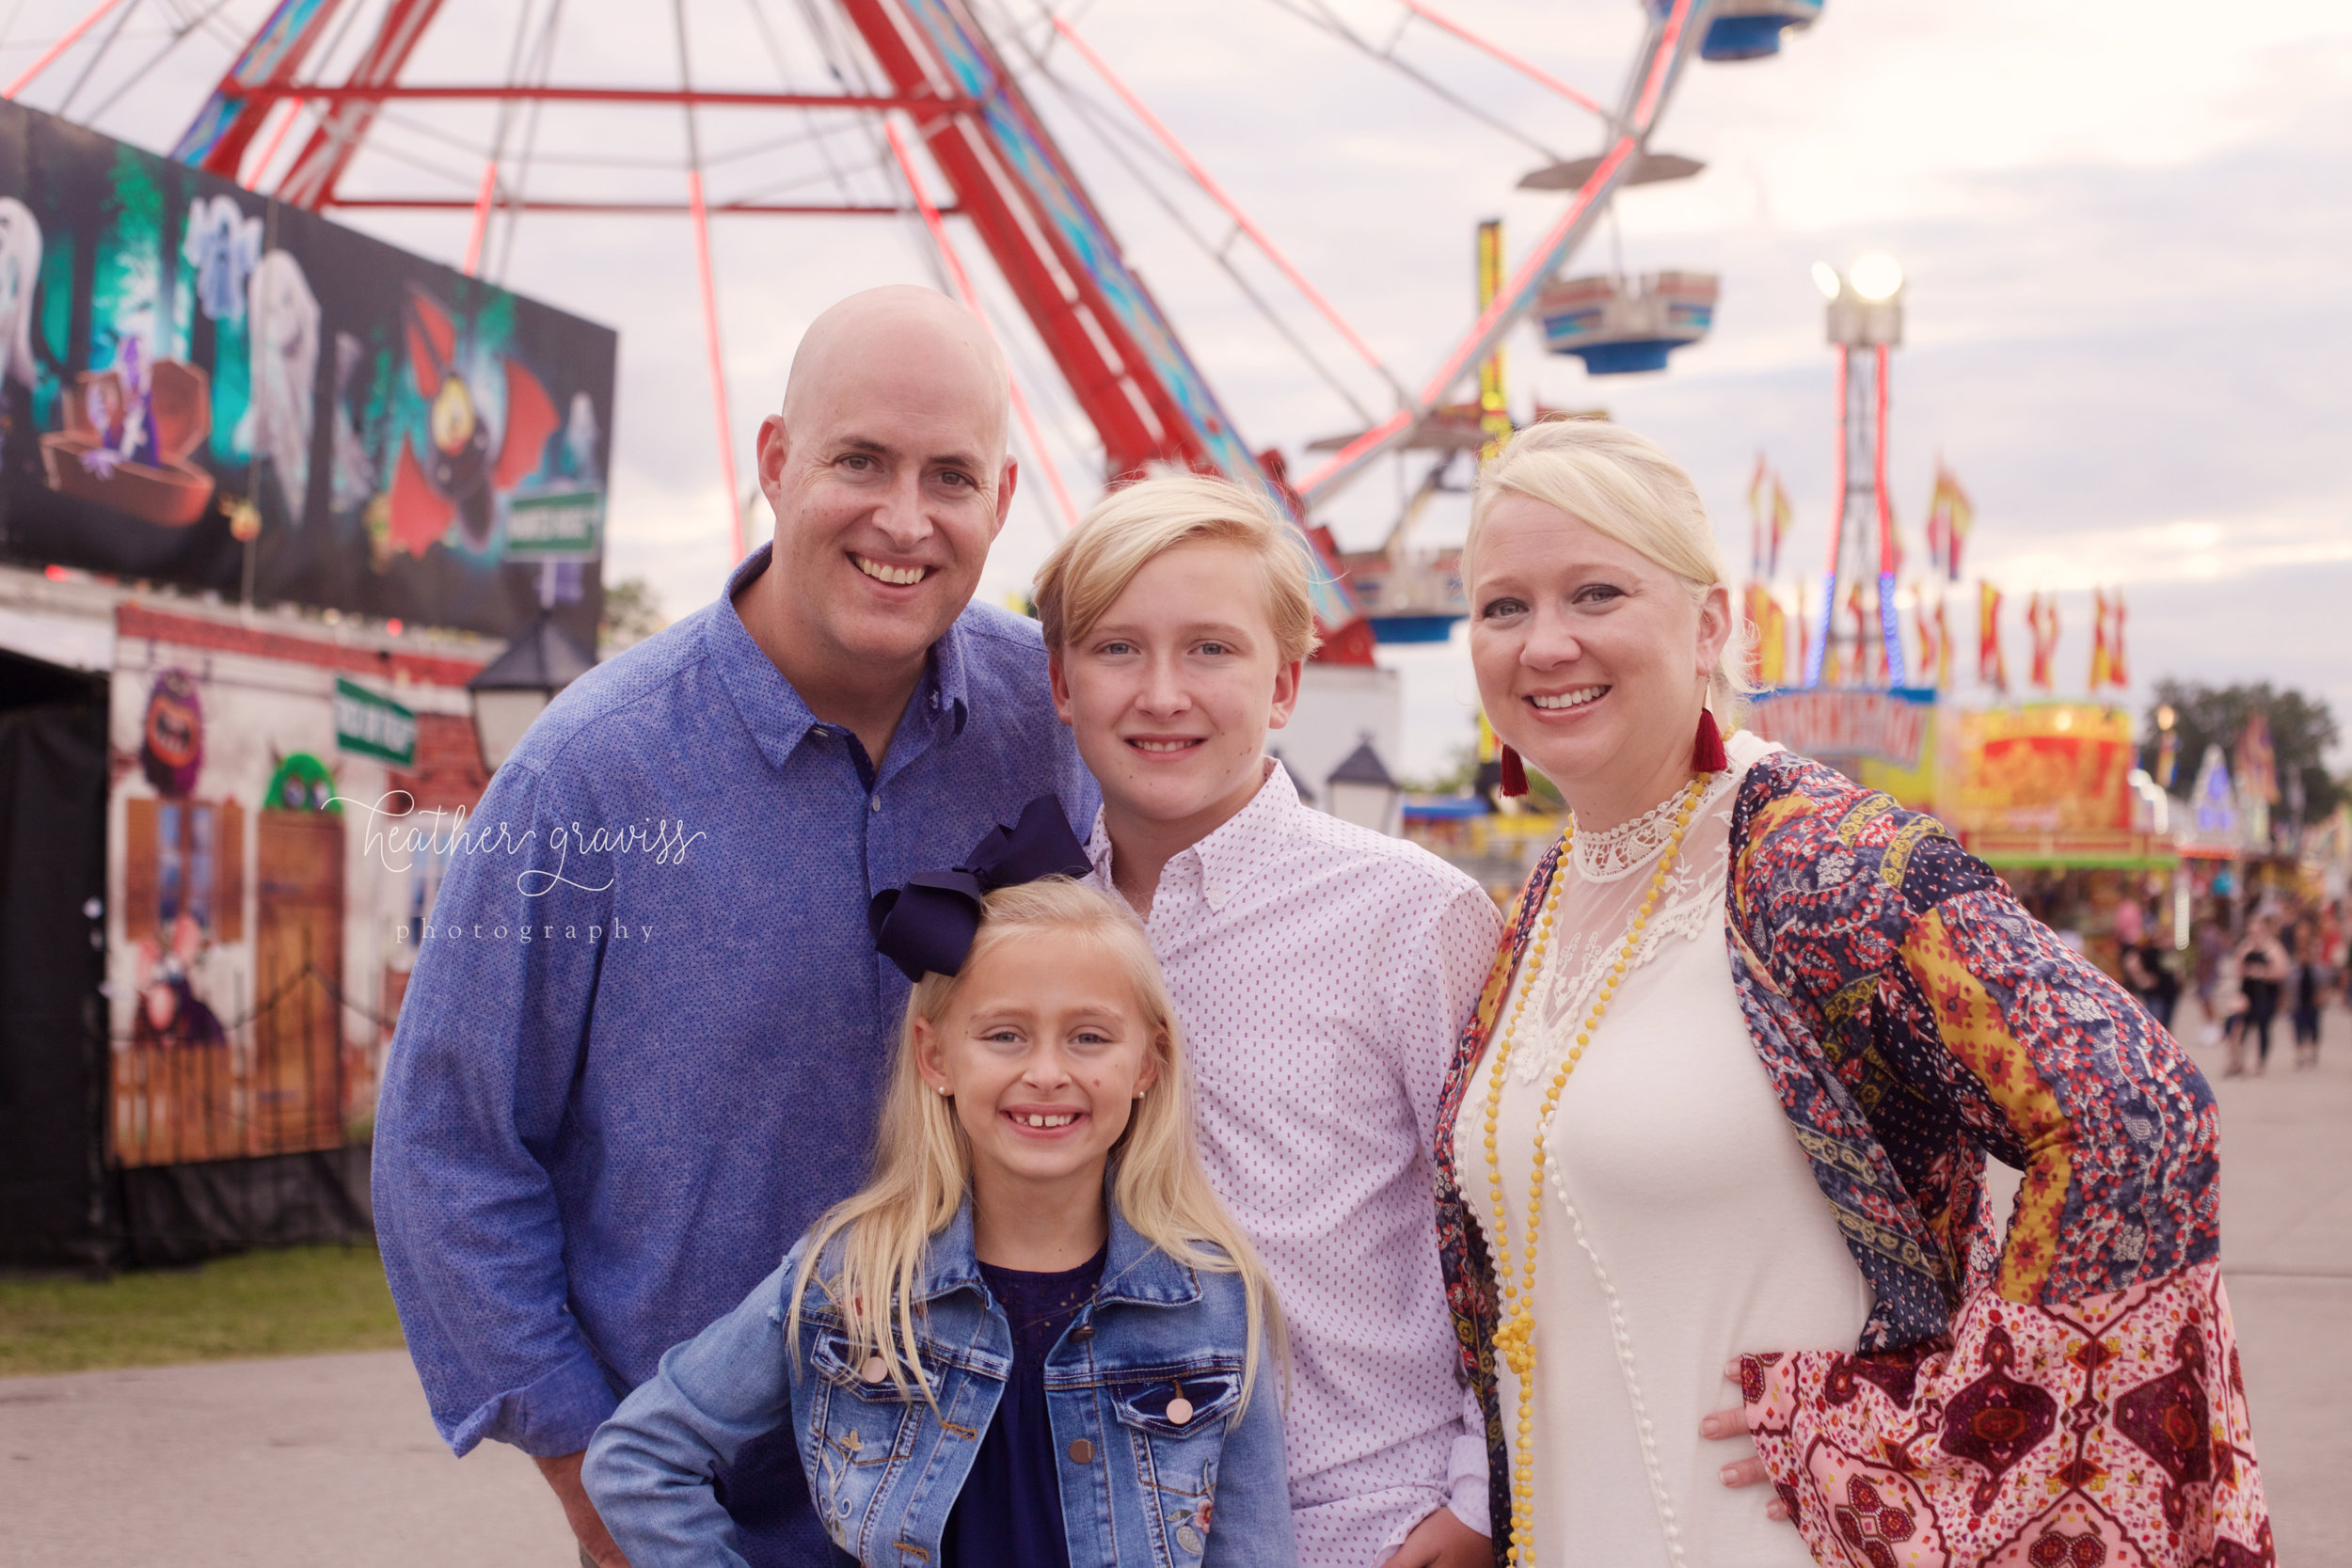 family-fun.jpg